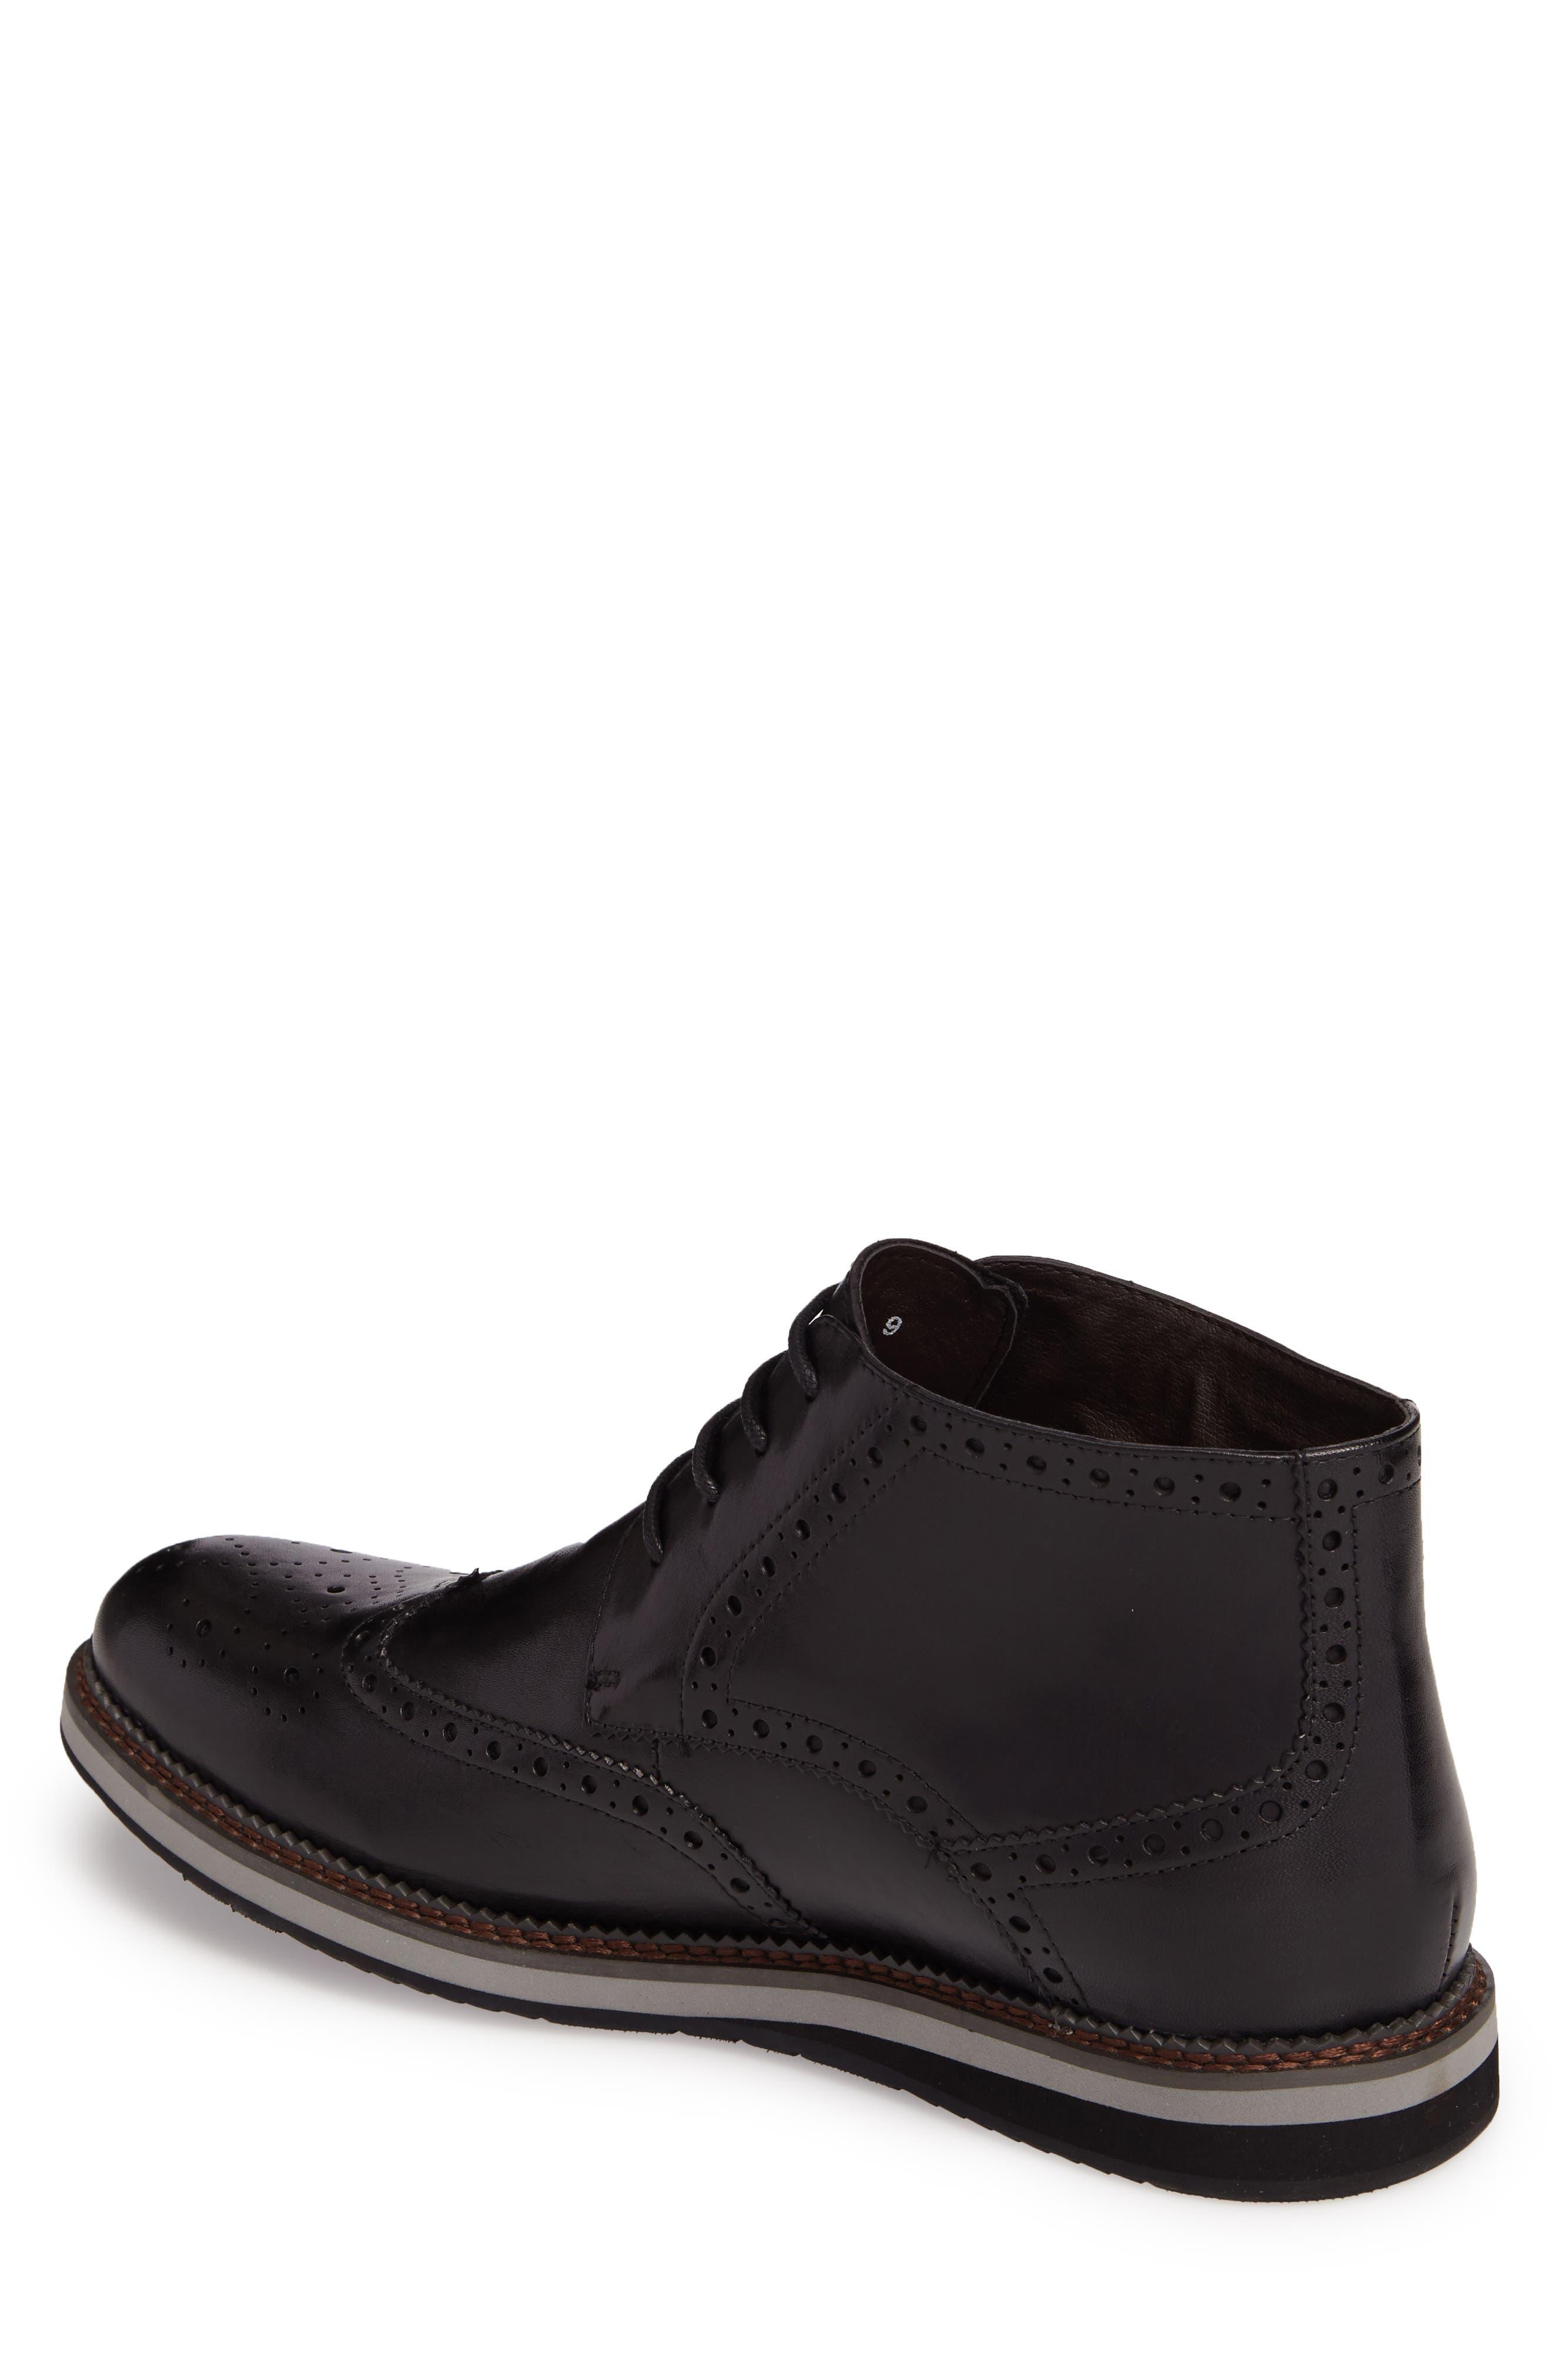 Ascot Wingtip Boot,                             Alternate thumbnail 2, color,                             Black Leather